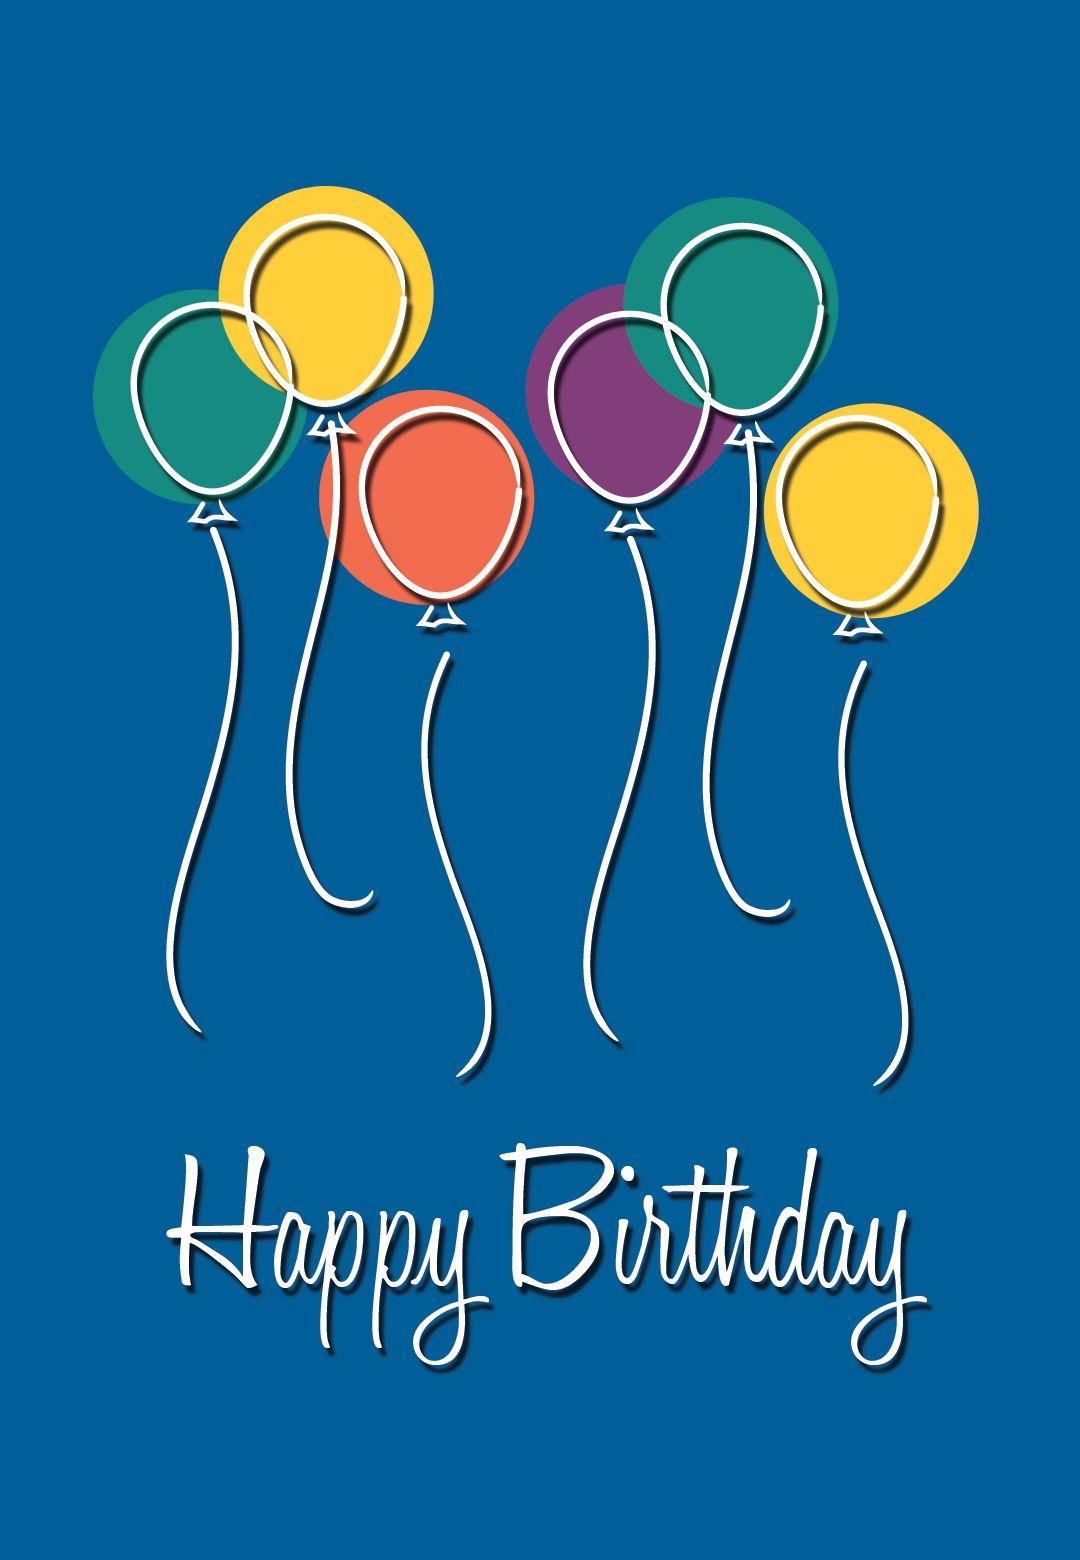 Free printable birthday balloons greeting card happy